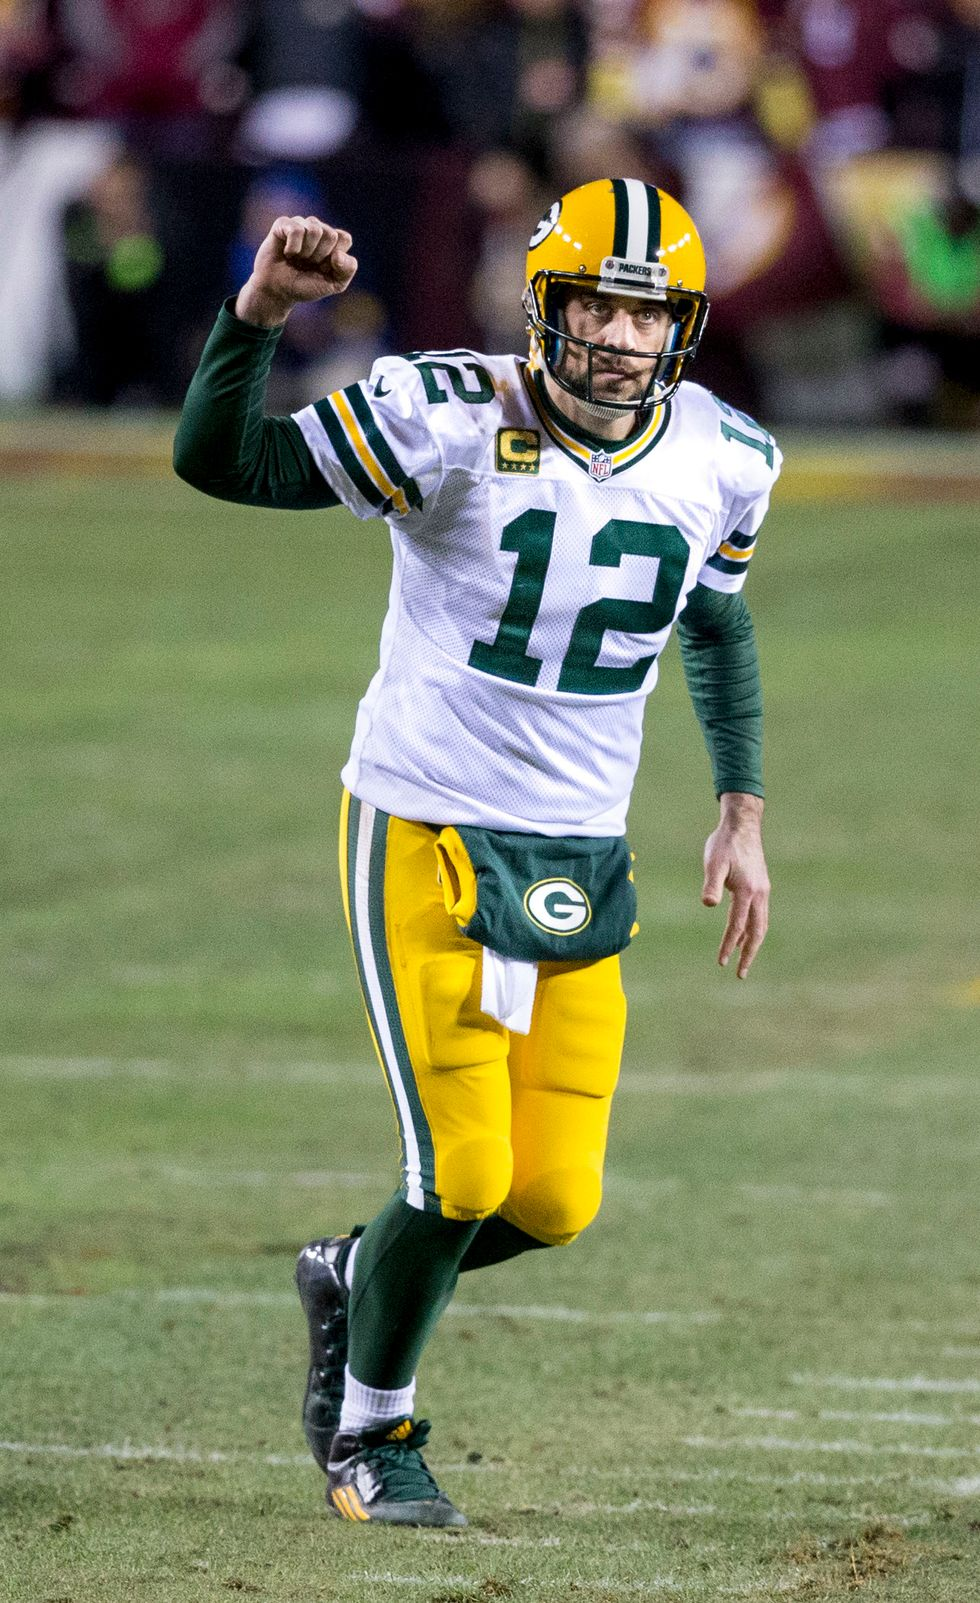 2018 Season Preview: Analyzing NFC Quarterbacks